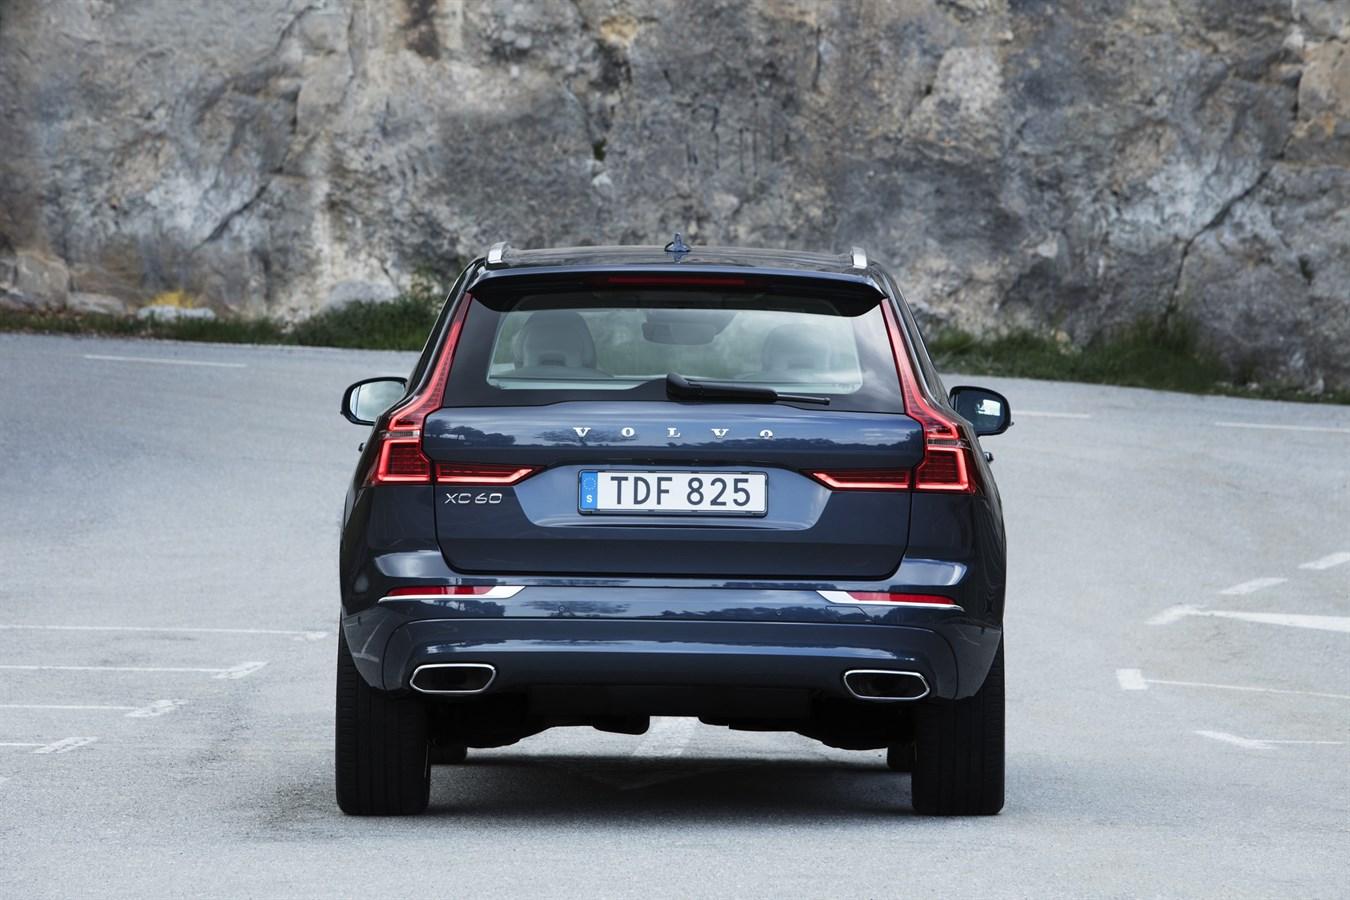 Volvo Xc60 Volvo Car Austria Pressezentrum